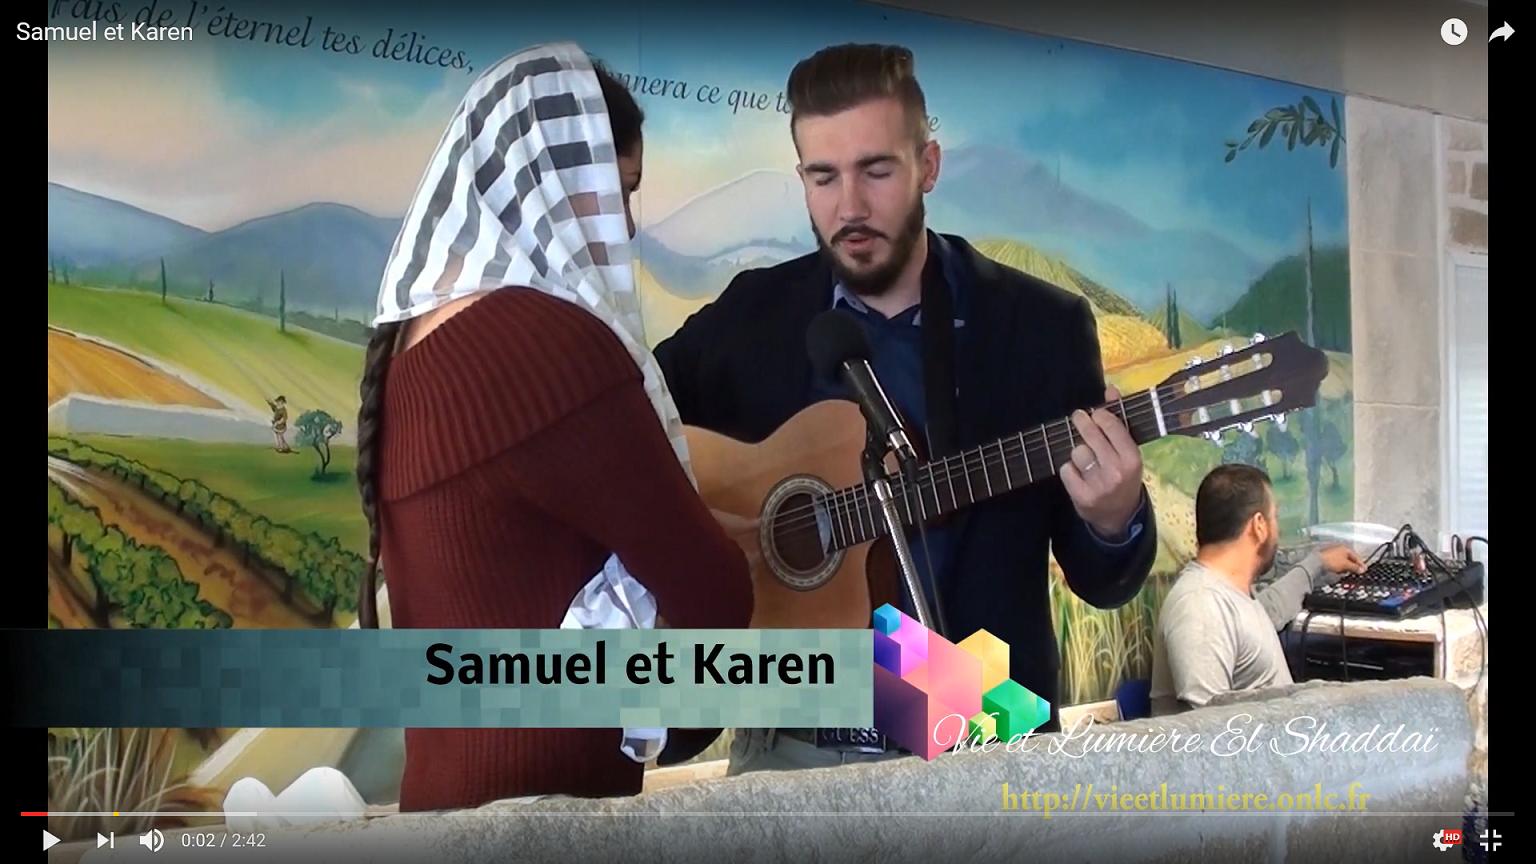 Samuel et Karen